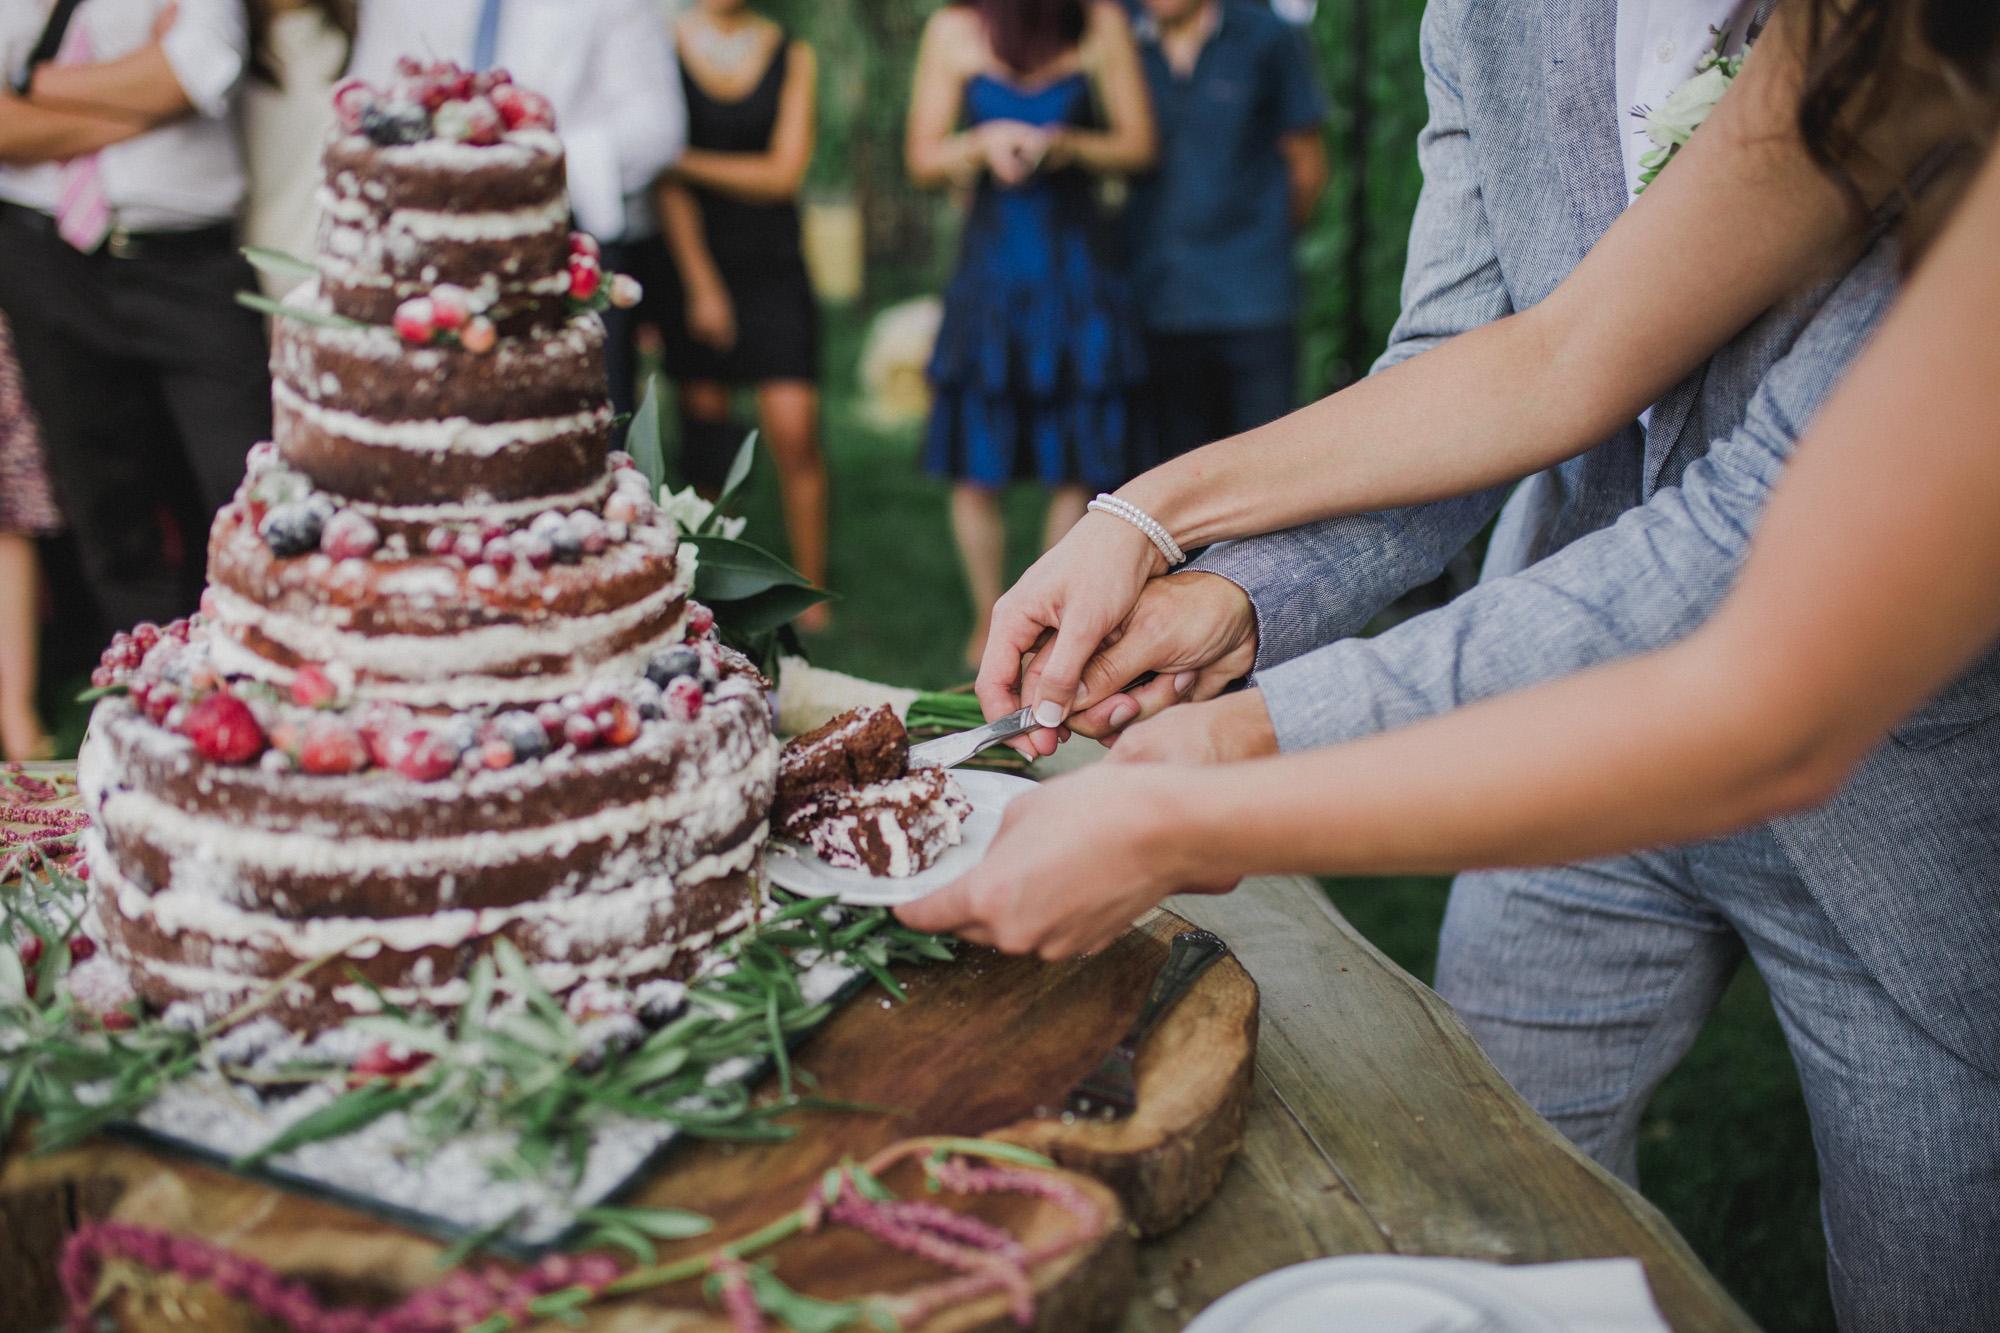 041-carina-e-samuel-wedding-casamento-quinta-dos-rouxinois-rustico-my-fancy-wedding-mafra-malveira-lisboa-sintra-cascais-filipe-santiago-fotografia-fotografo-lifestyle-destination-portugal